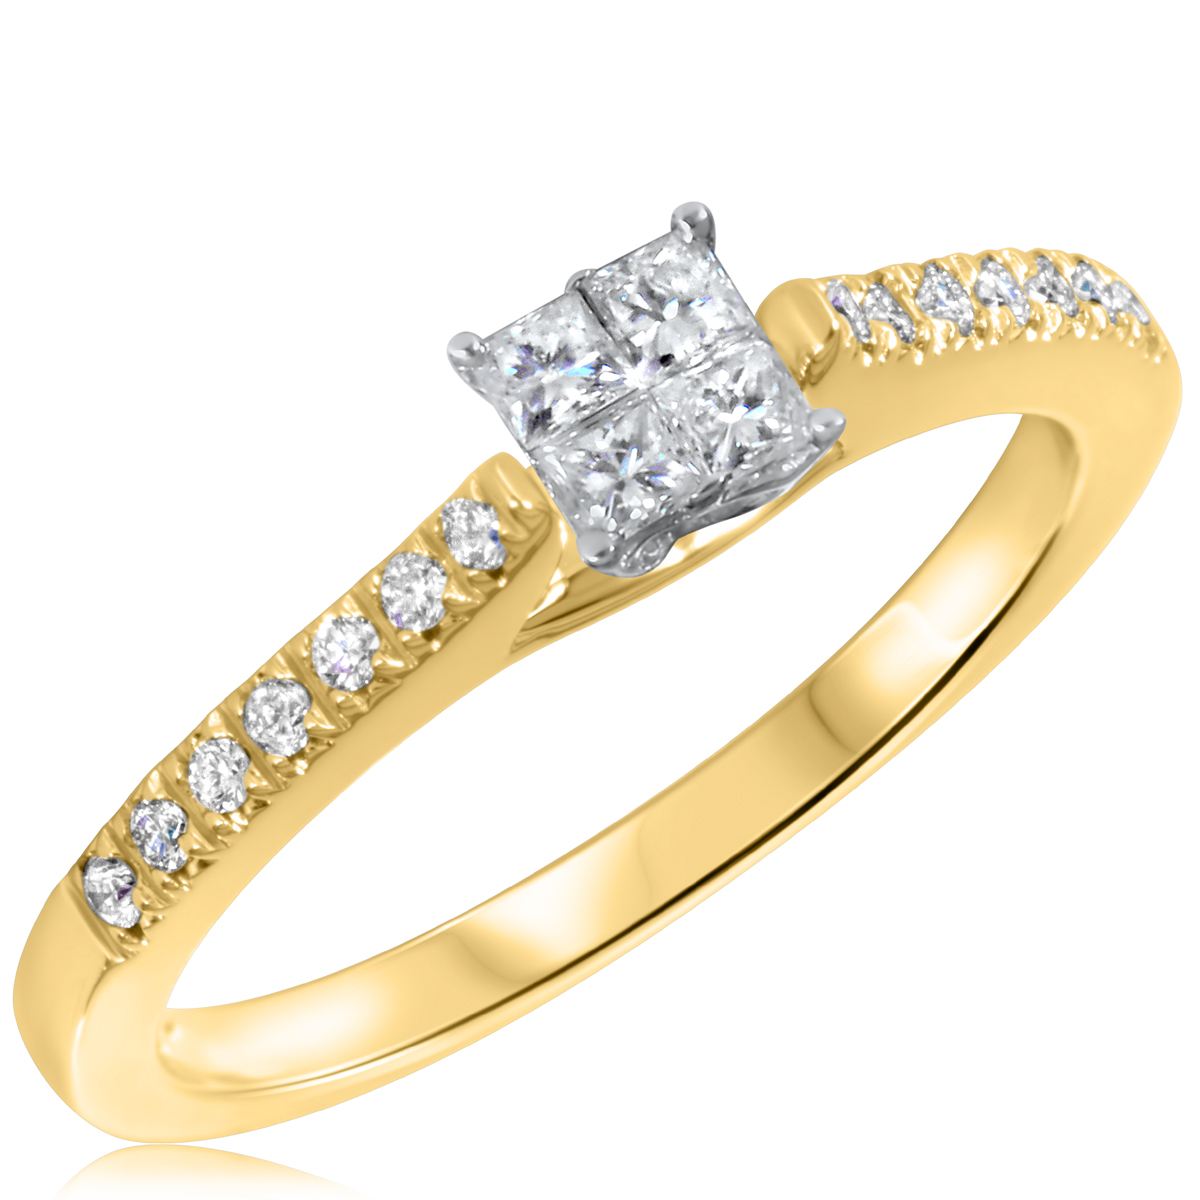 1/3 CT. T.W. Diamond Ladies Engagement Ring 14K Yellow Gold- Size 8